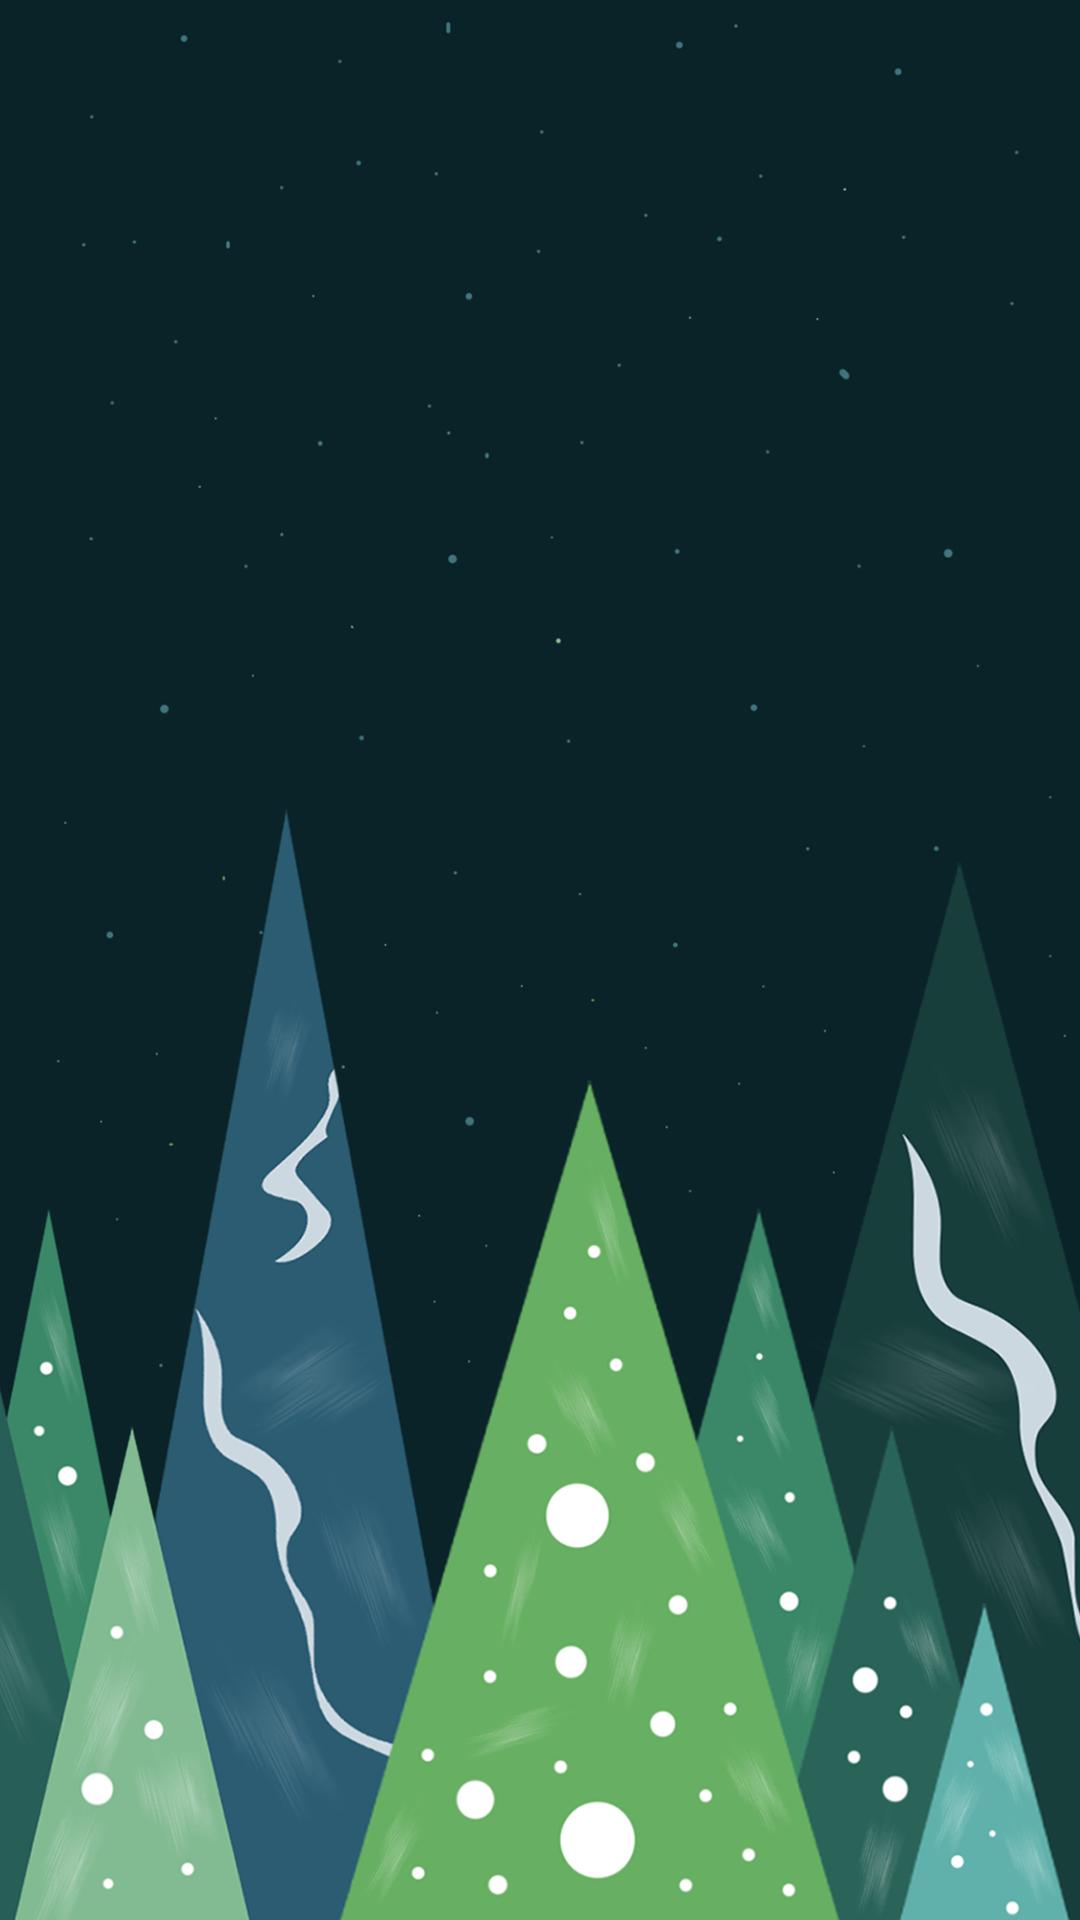 Apple Iphone X Wallpaper Download รวมภาพพื้นหลัง Iphone Wallpaper สำหรับเทศกาลคริสต์มาส